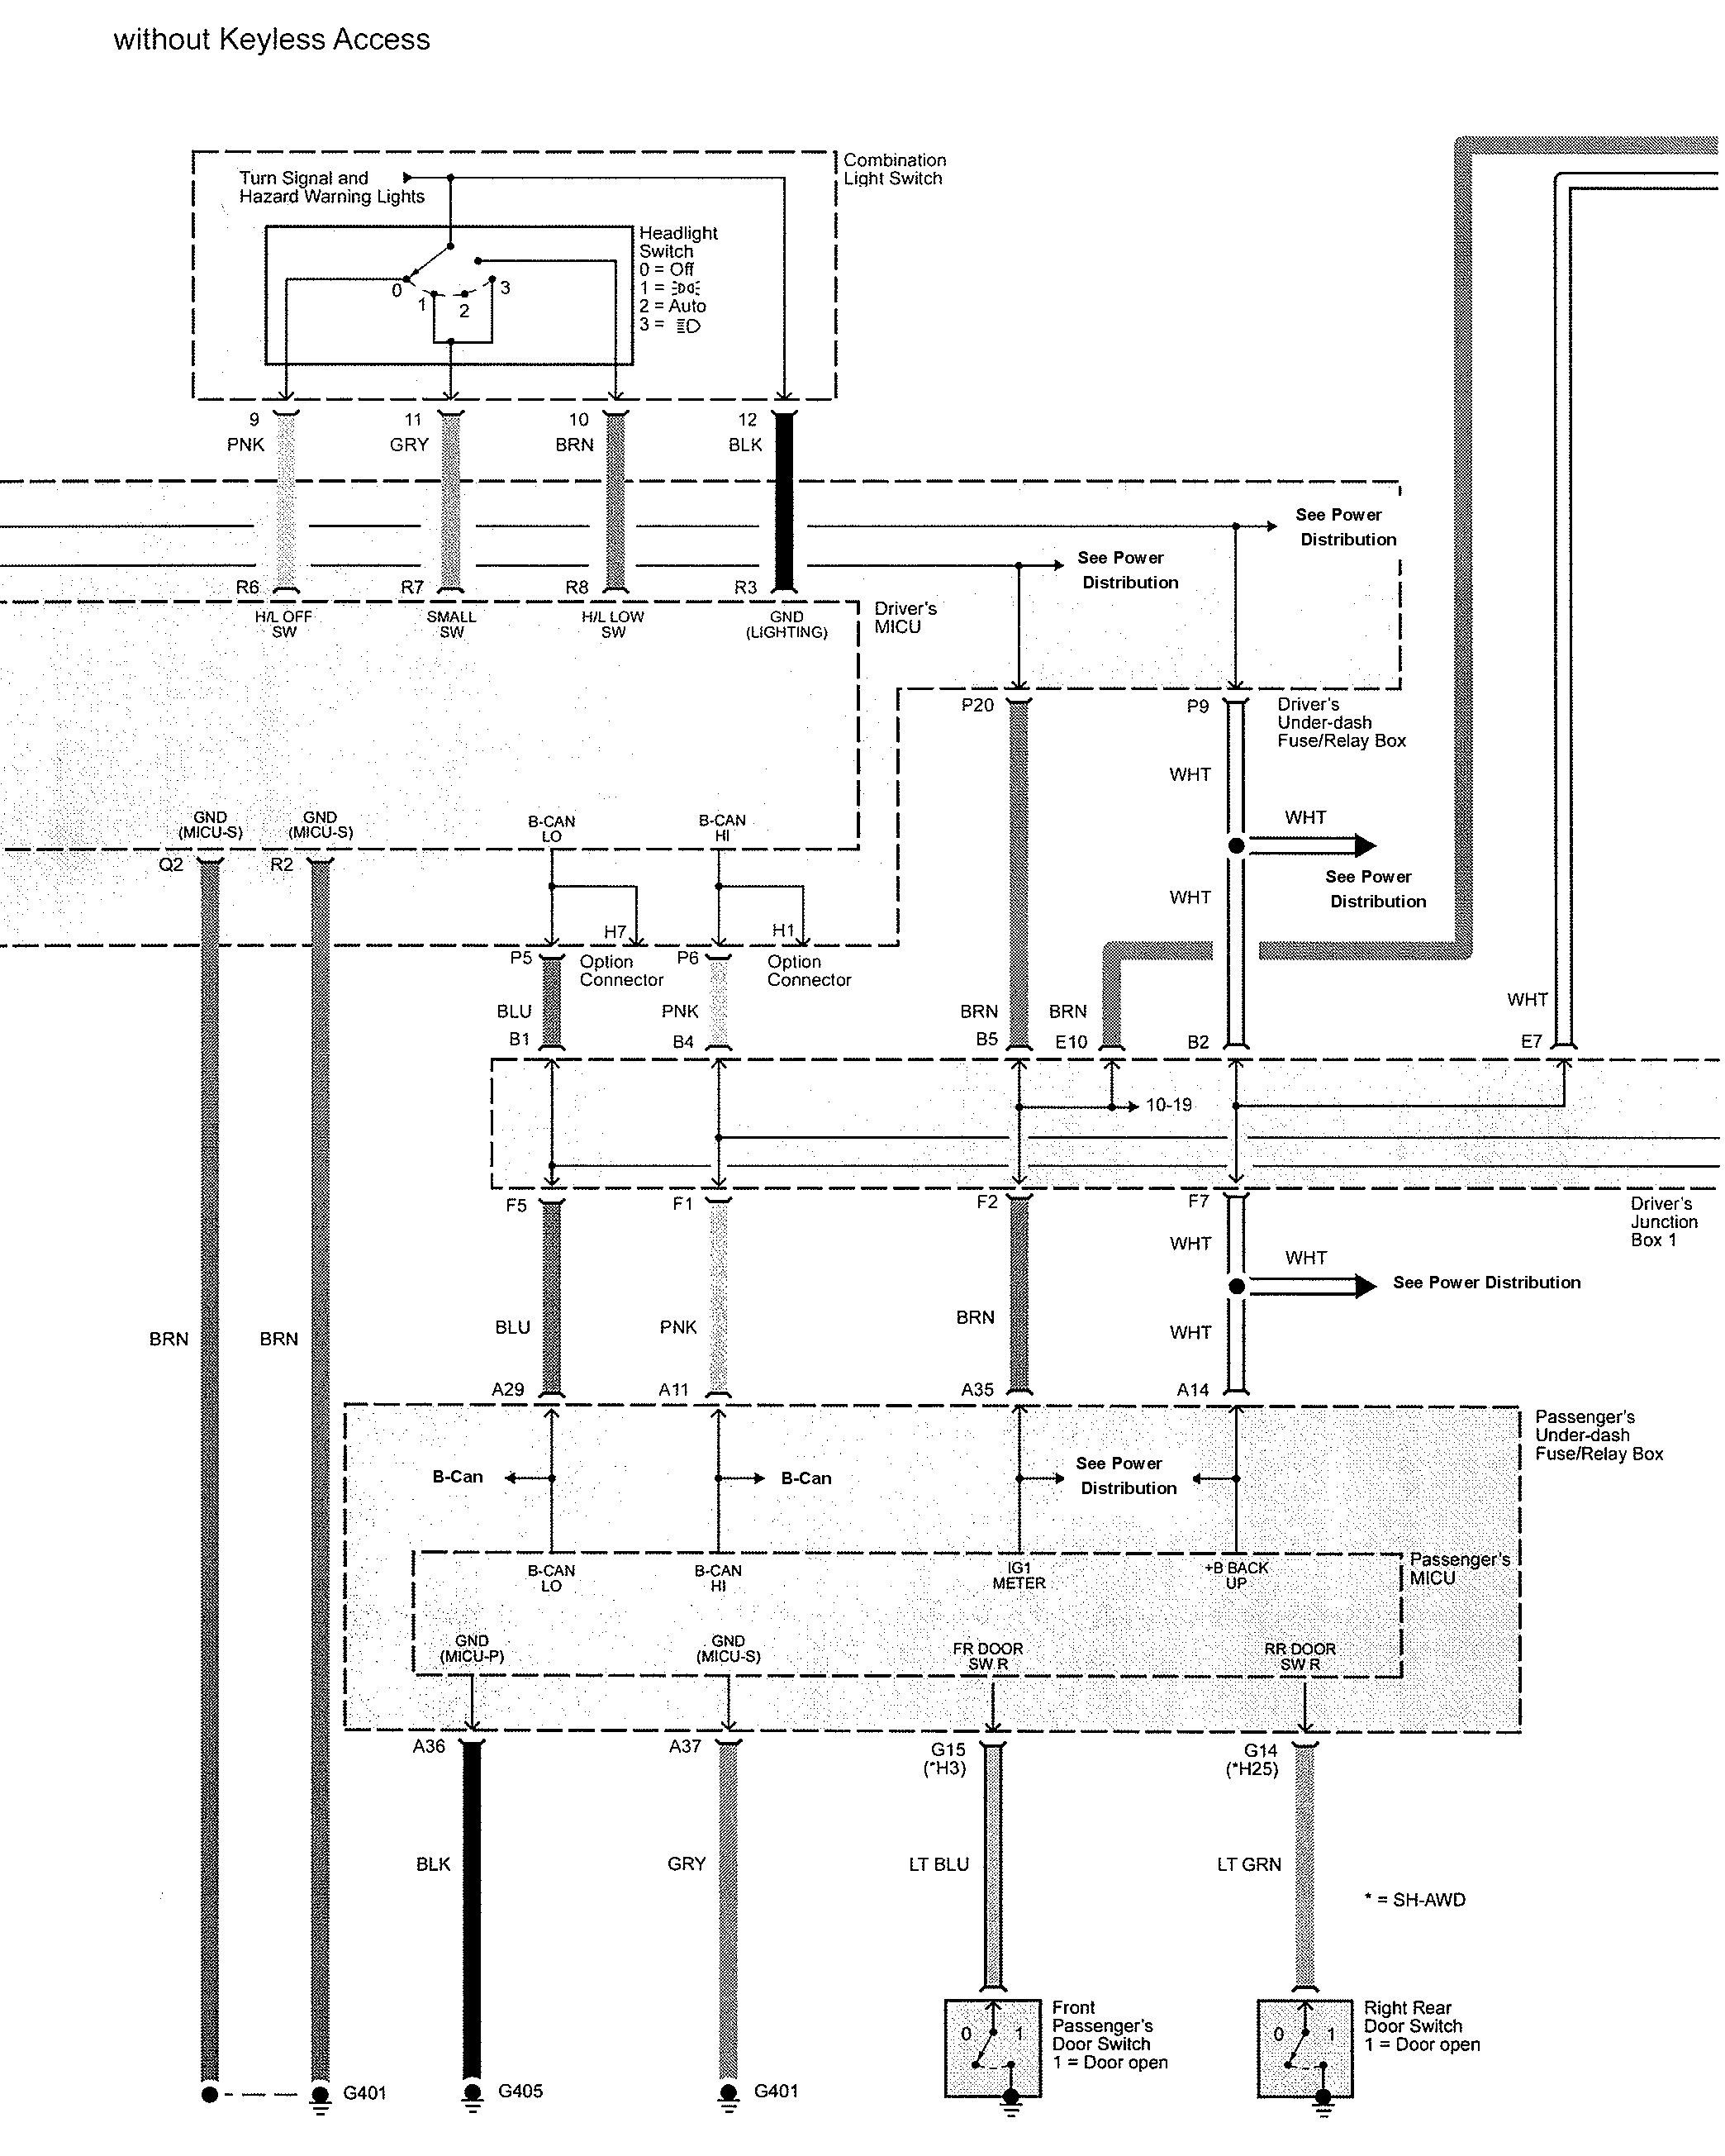 acura tl wiring diagram warning indectors 2 2009 acura tl (2009) wiring diagrams warning indicators carknowledge a35 wiring diagram at sewacar.co